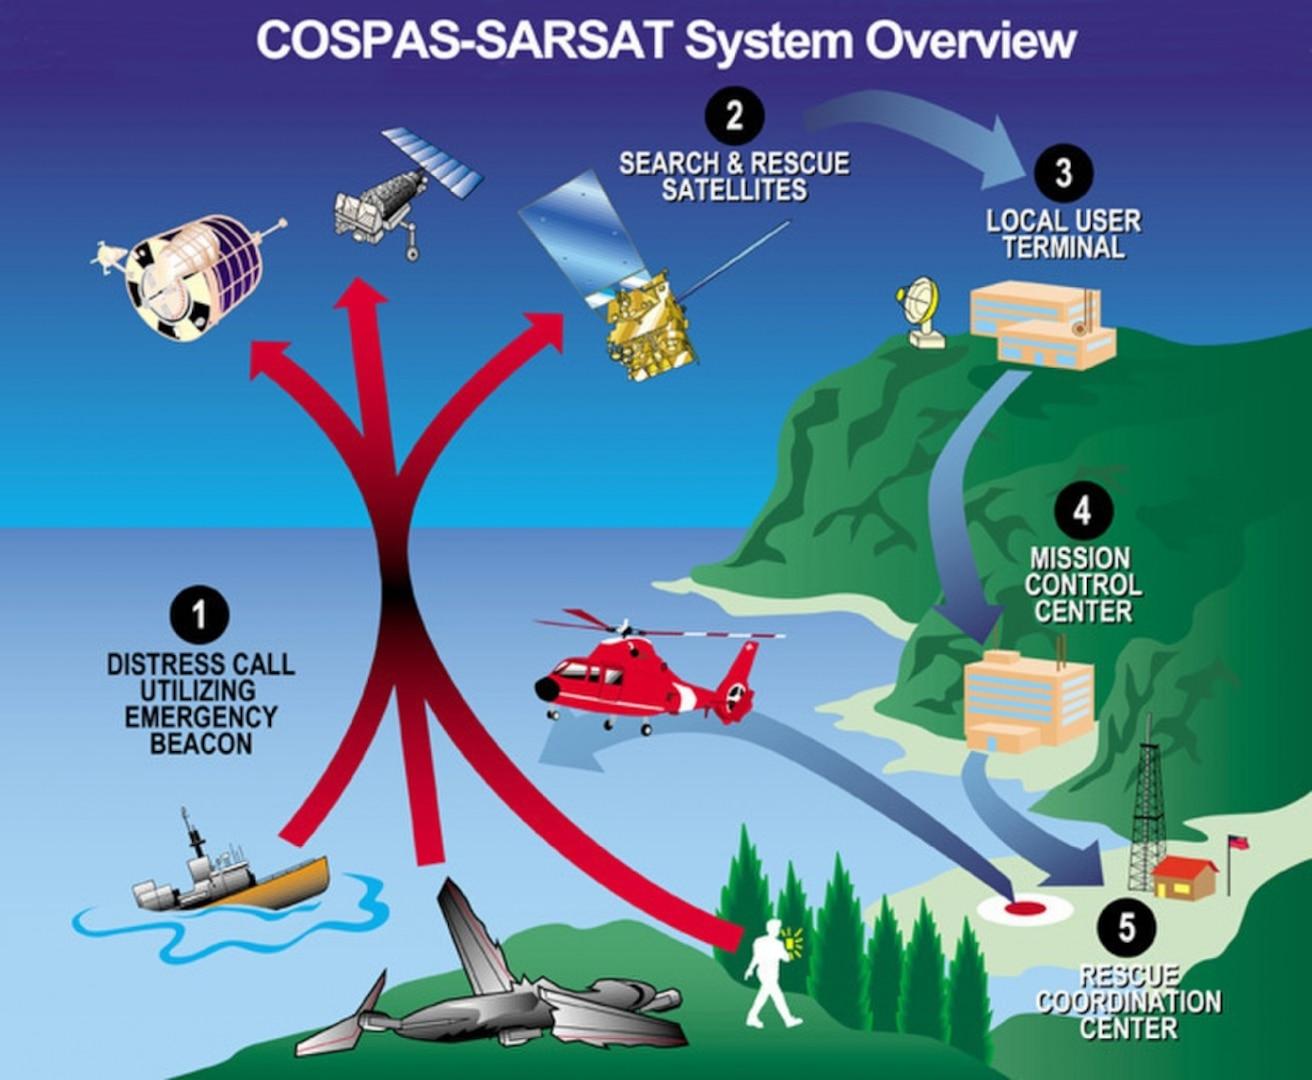 Coast Guard recognizes 406 Day, emergency locator beacon awareness